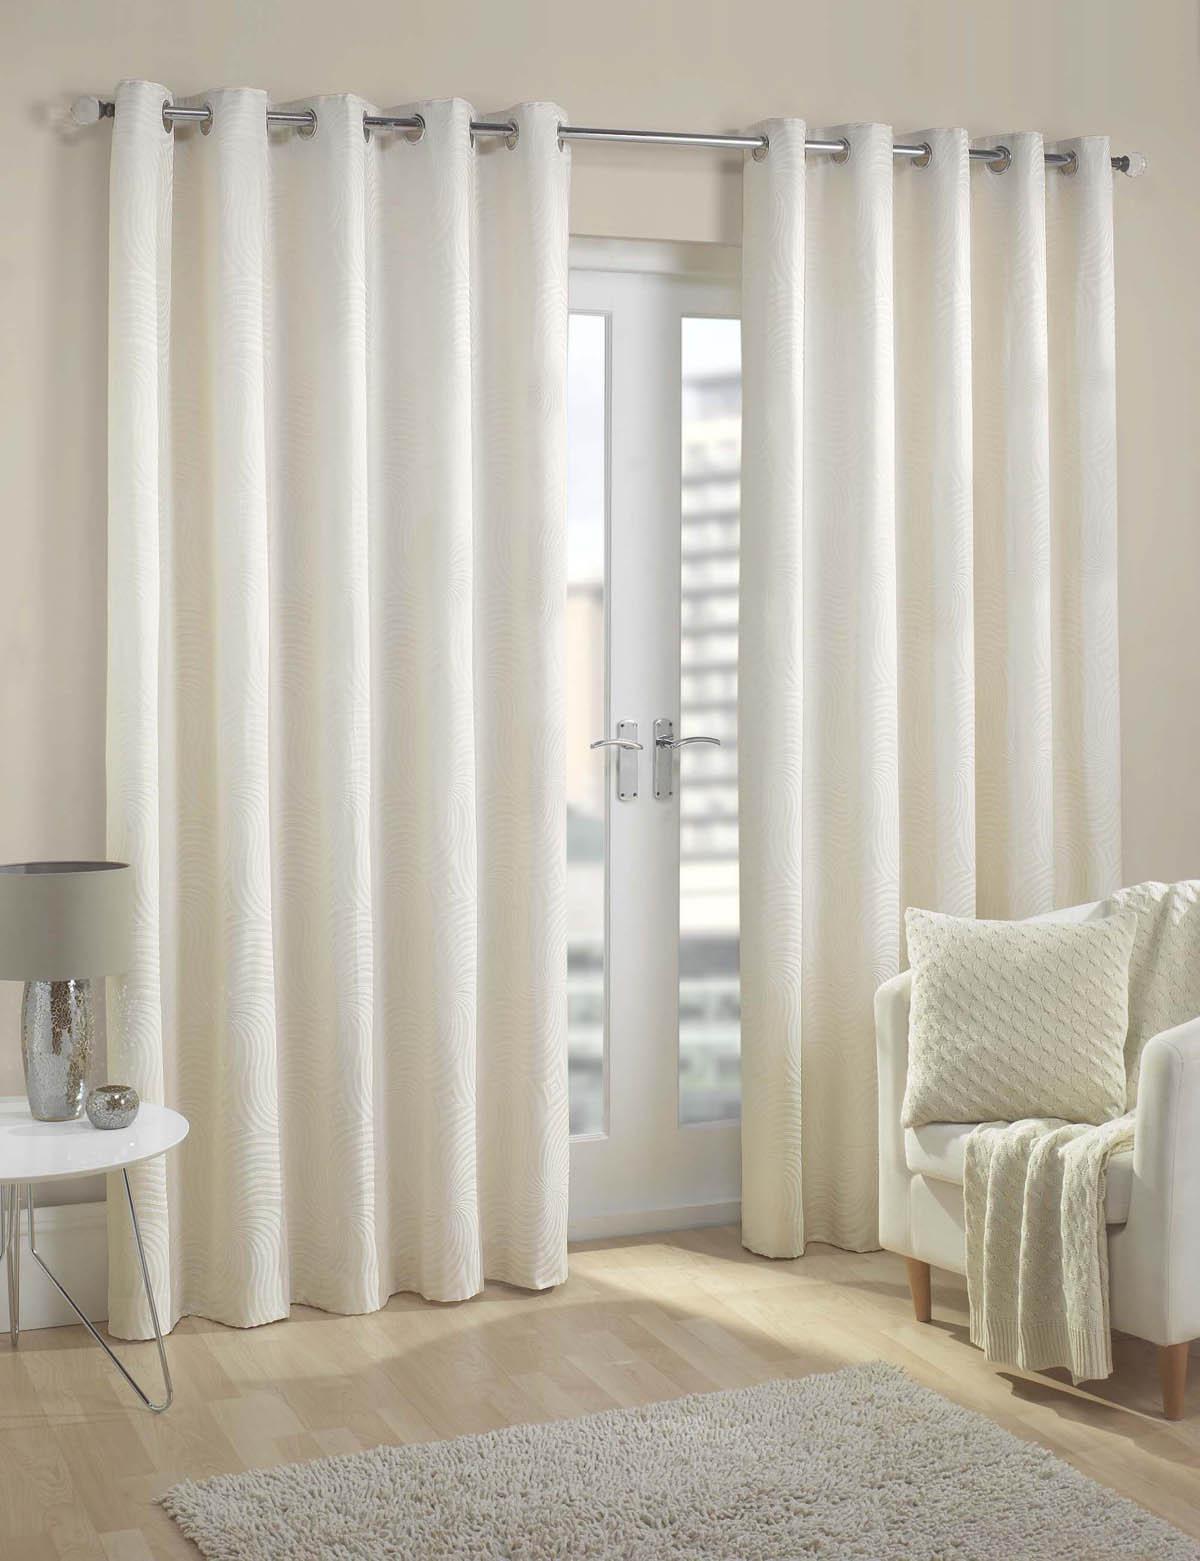 White Eyelet Curtains Uk Part - 24: Metz Ready Made Eyelet Curtains